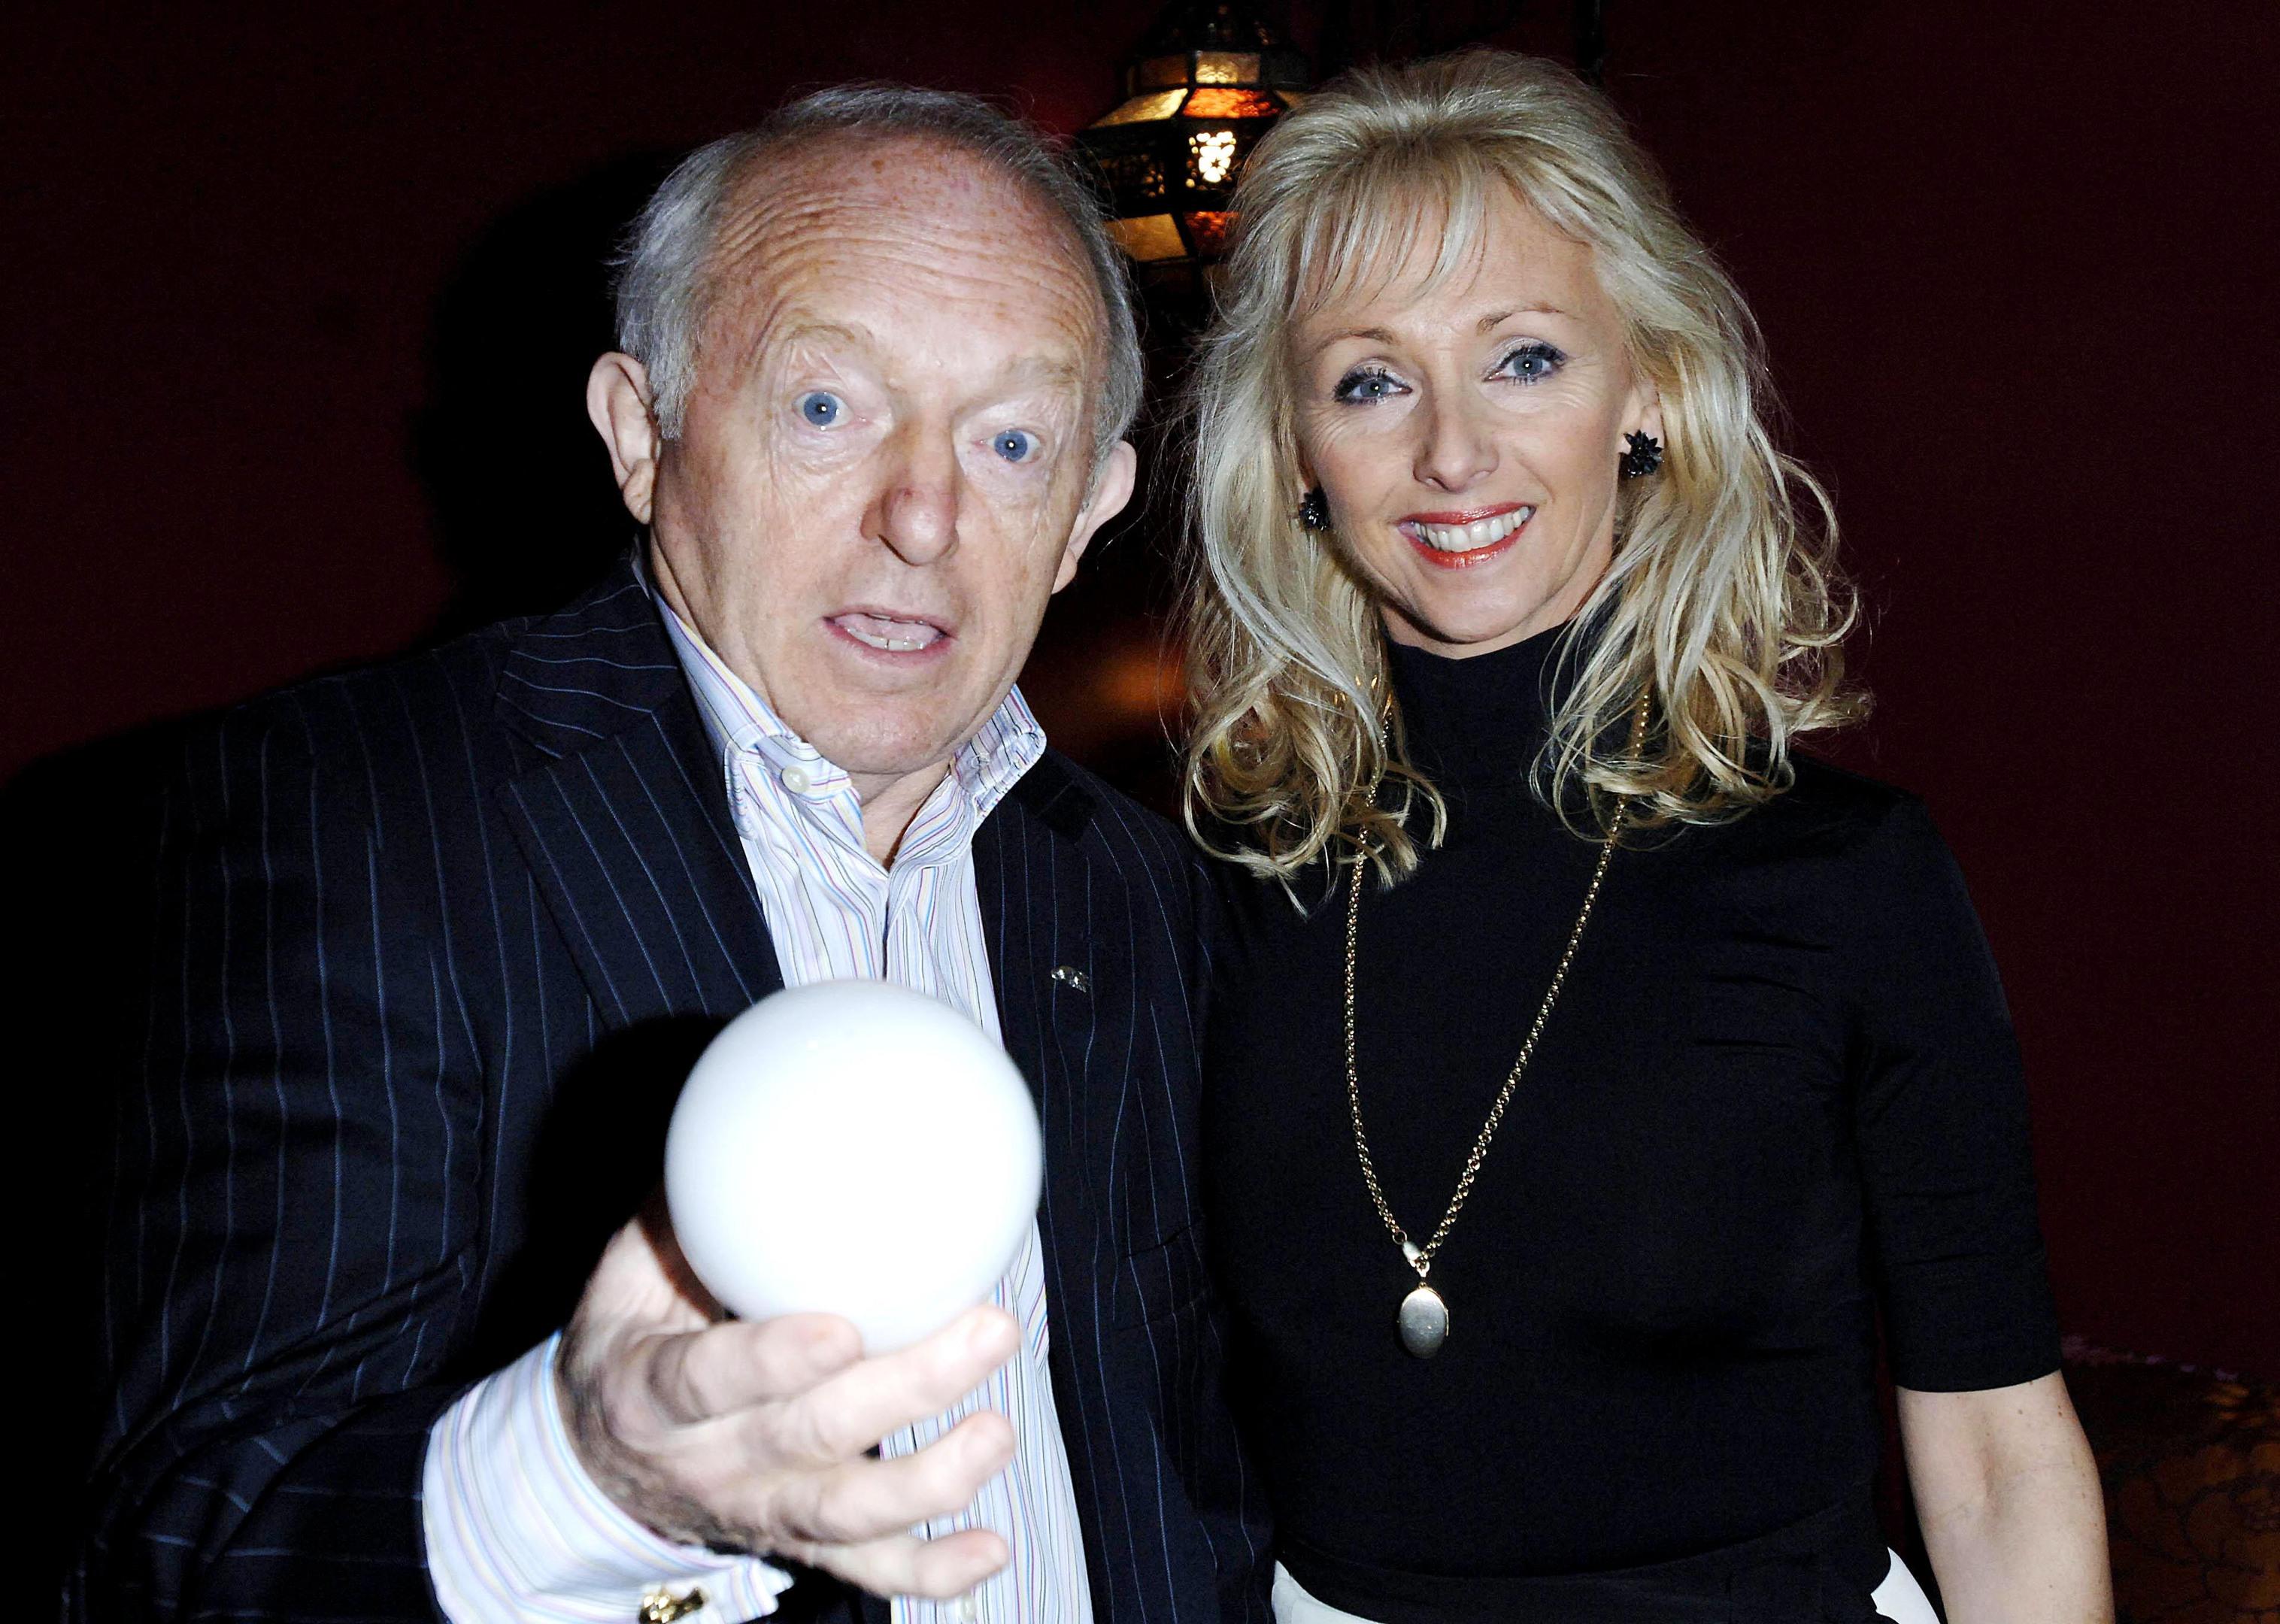 Paul Daniels and wife Debbie McGee (Joel Ryan/PA Wire)